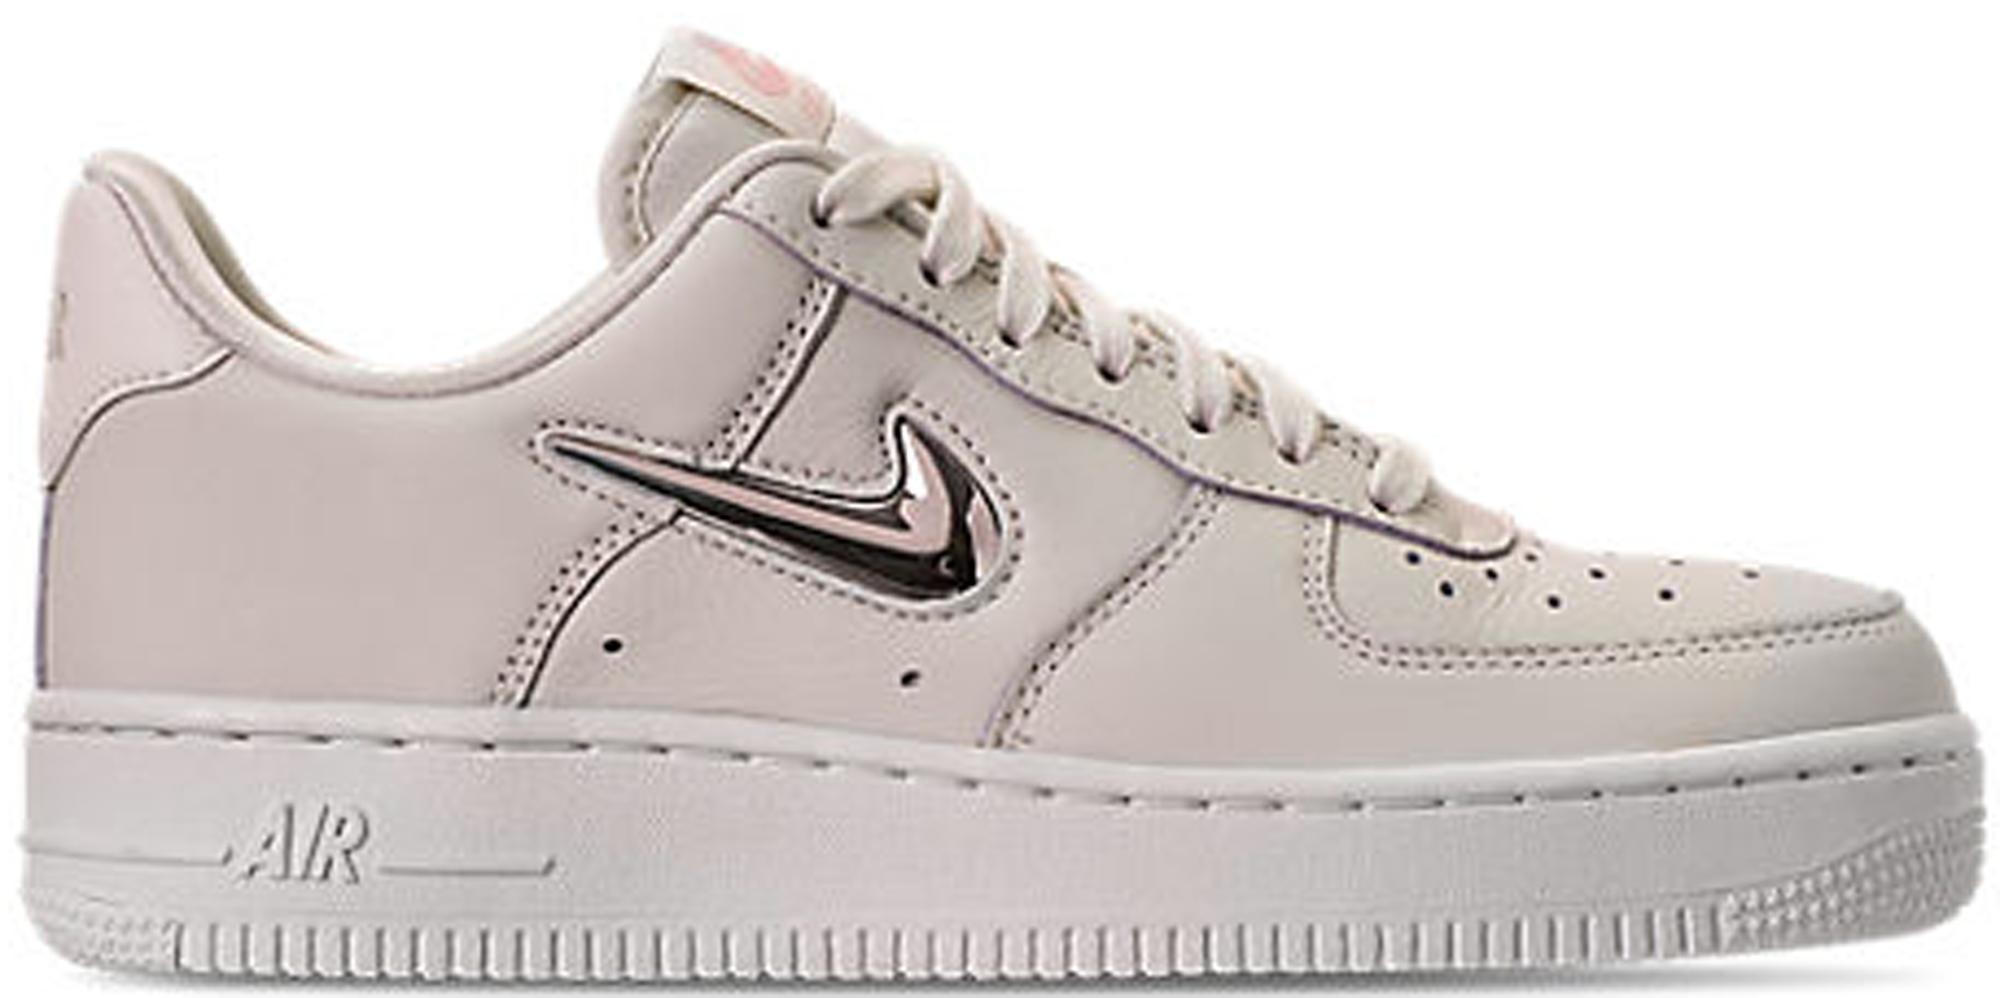 Nike Air Force 1 Low Jewel Phantom (W